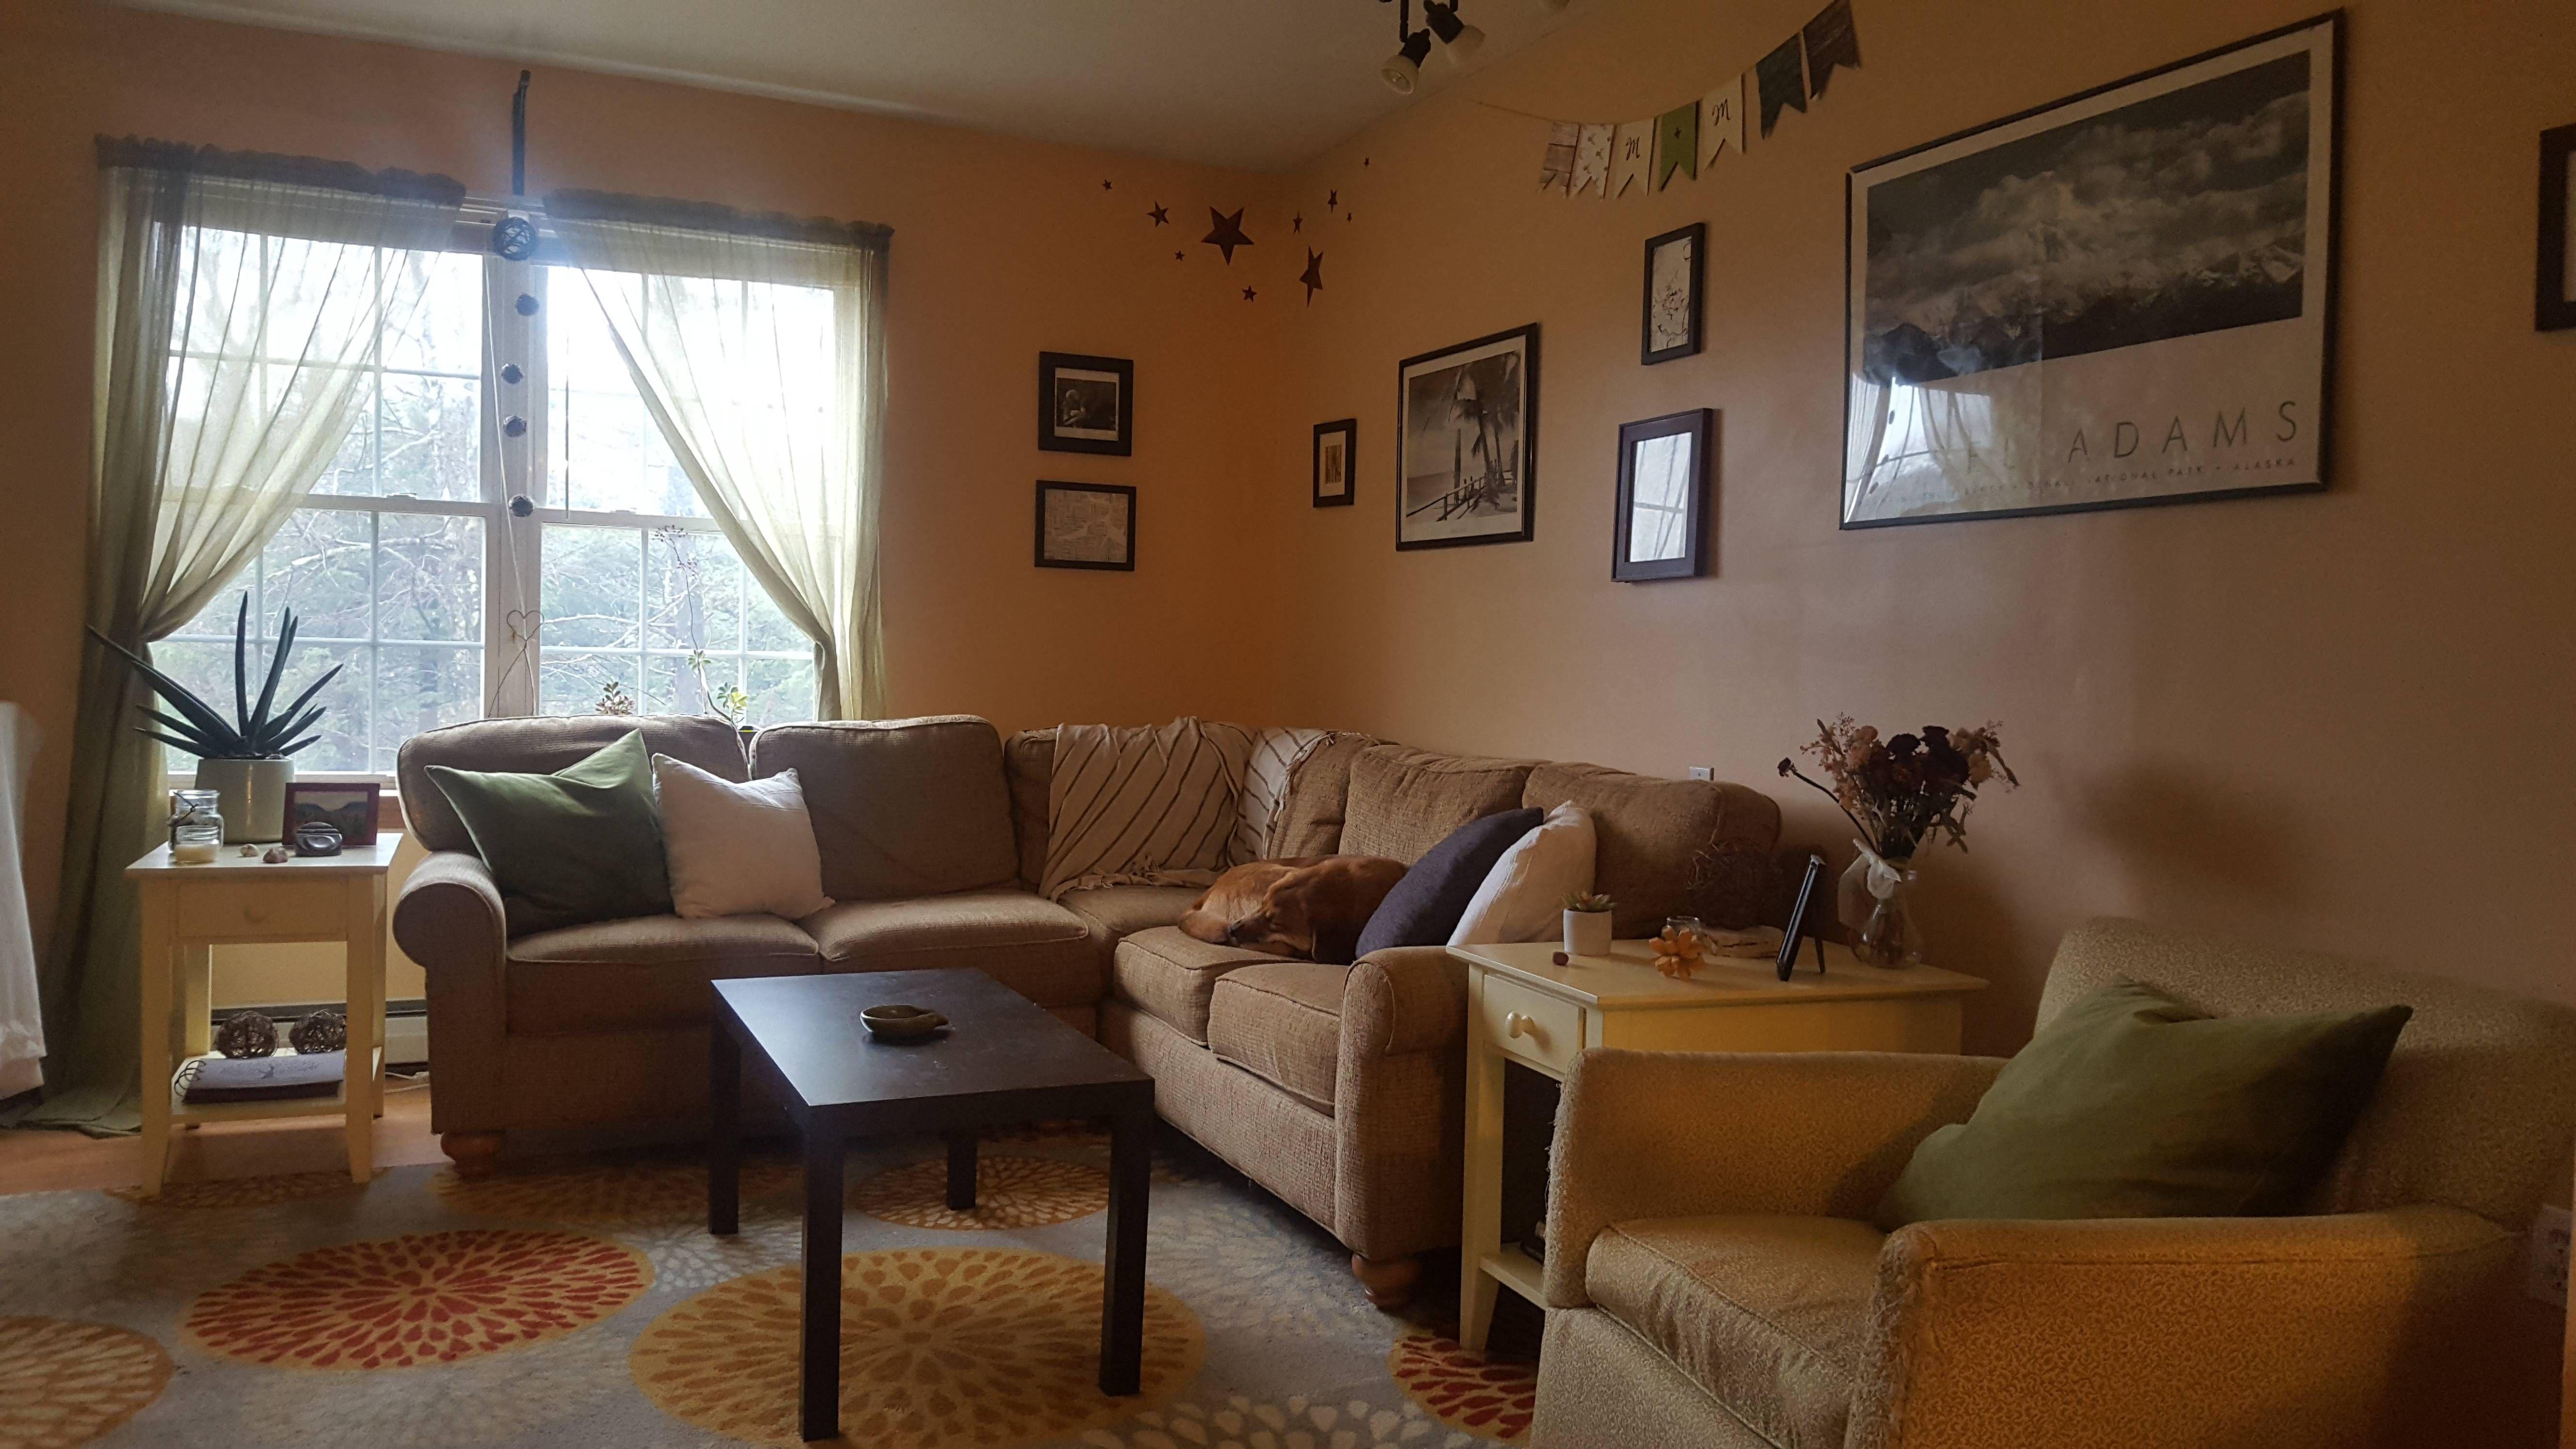 Our mountainside living room in Ashburnham MA #home #homedesigns #design #homeideas #roomideas #room #rooms #house #housedesigns #roomdesigns